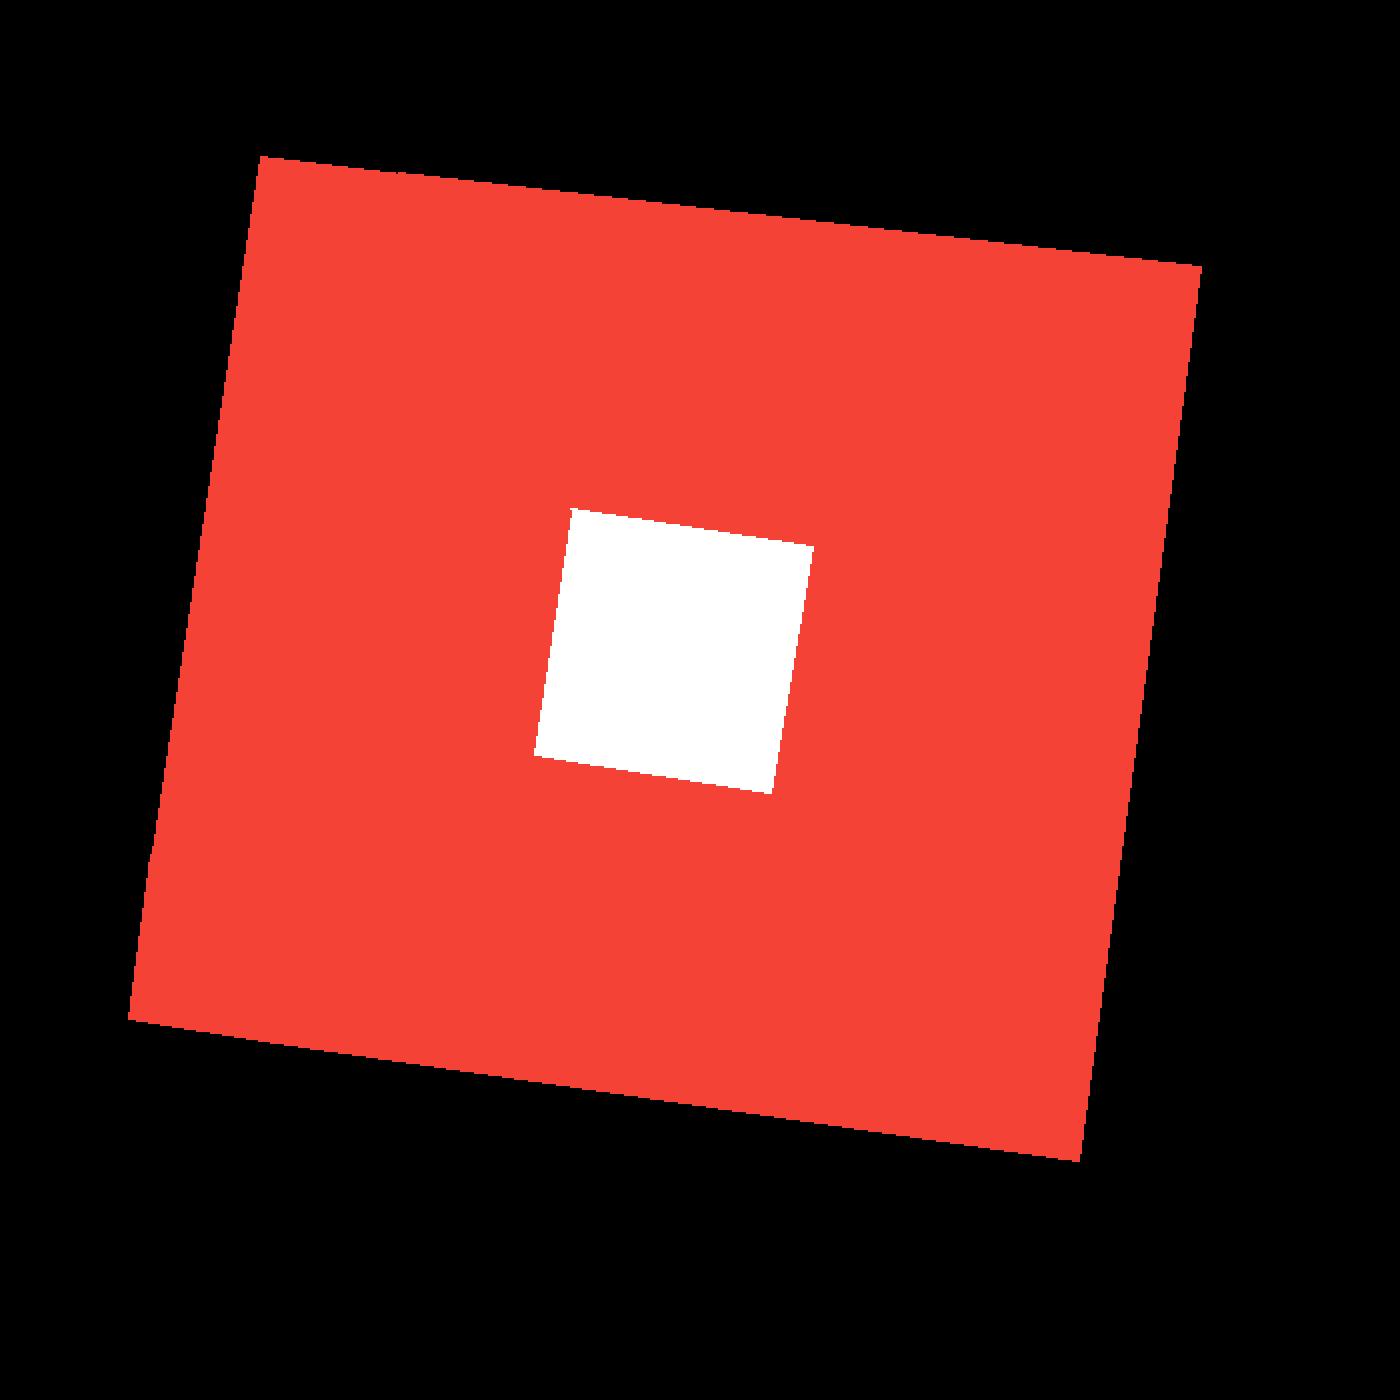 Roblox Logo O New Roblox - Wholefed org